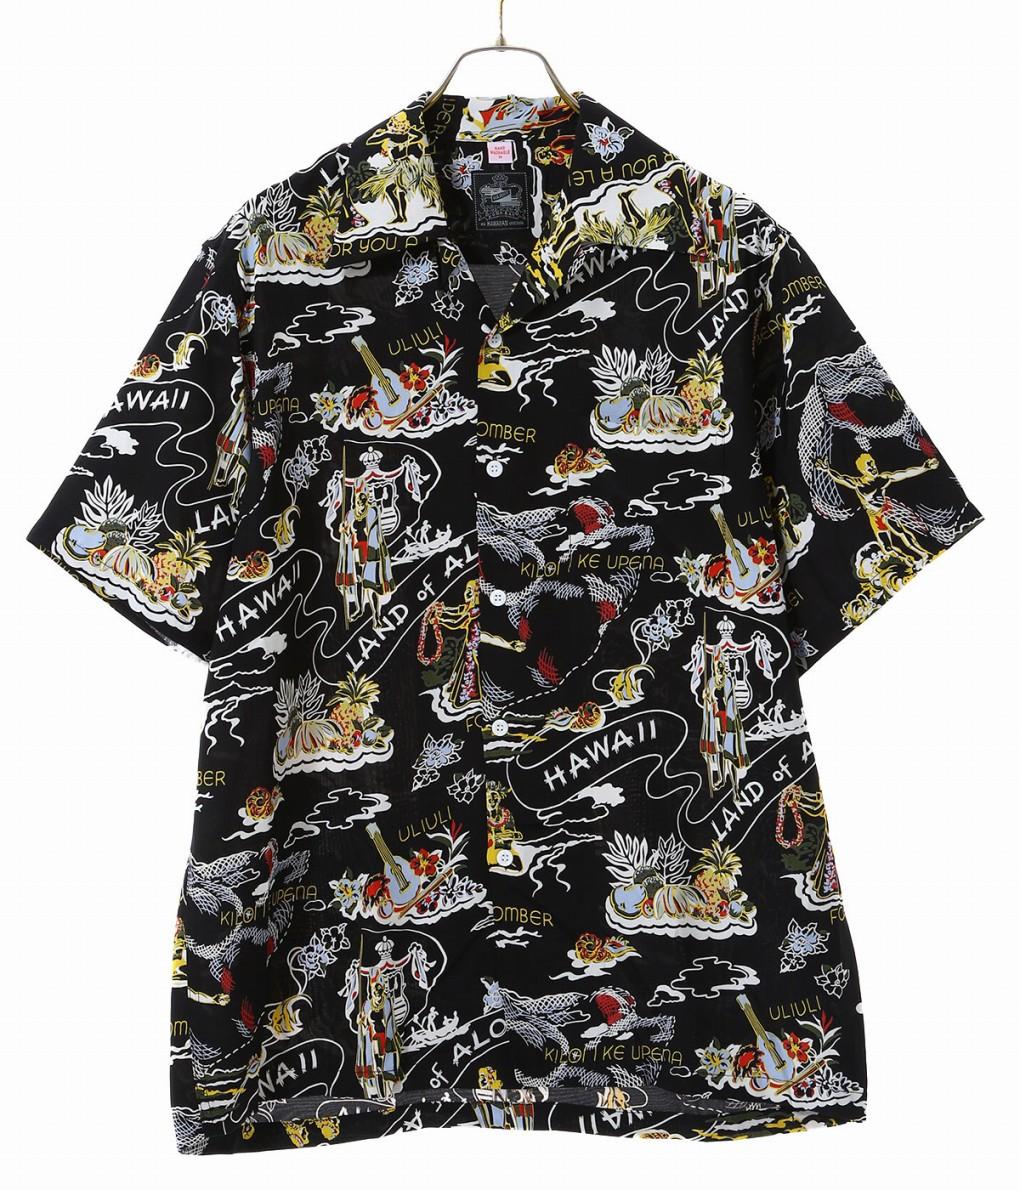 KONA BAY HAWAII / コナベイハワイ : Hawaiian Shirts -ASS'T- : アロハシャツ ハワイアン シャツ アロハシャツ メンズ : KONA-504S 【AST】